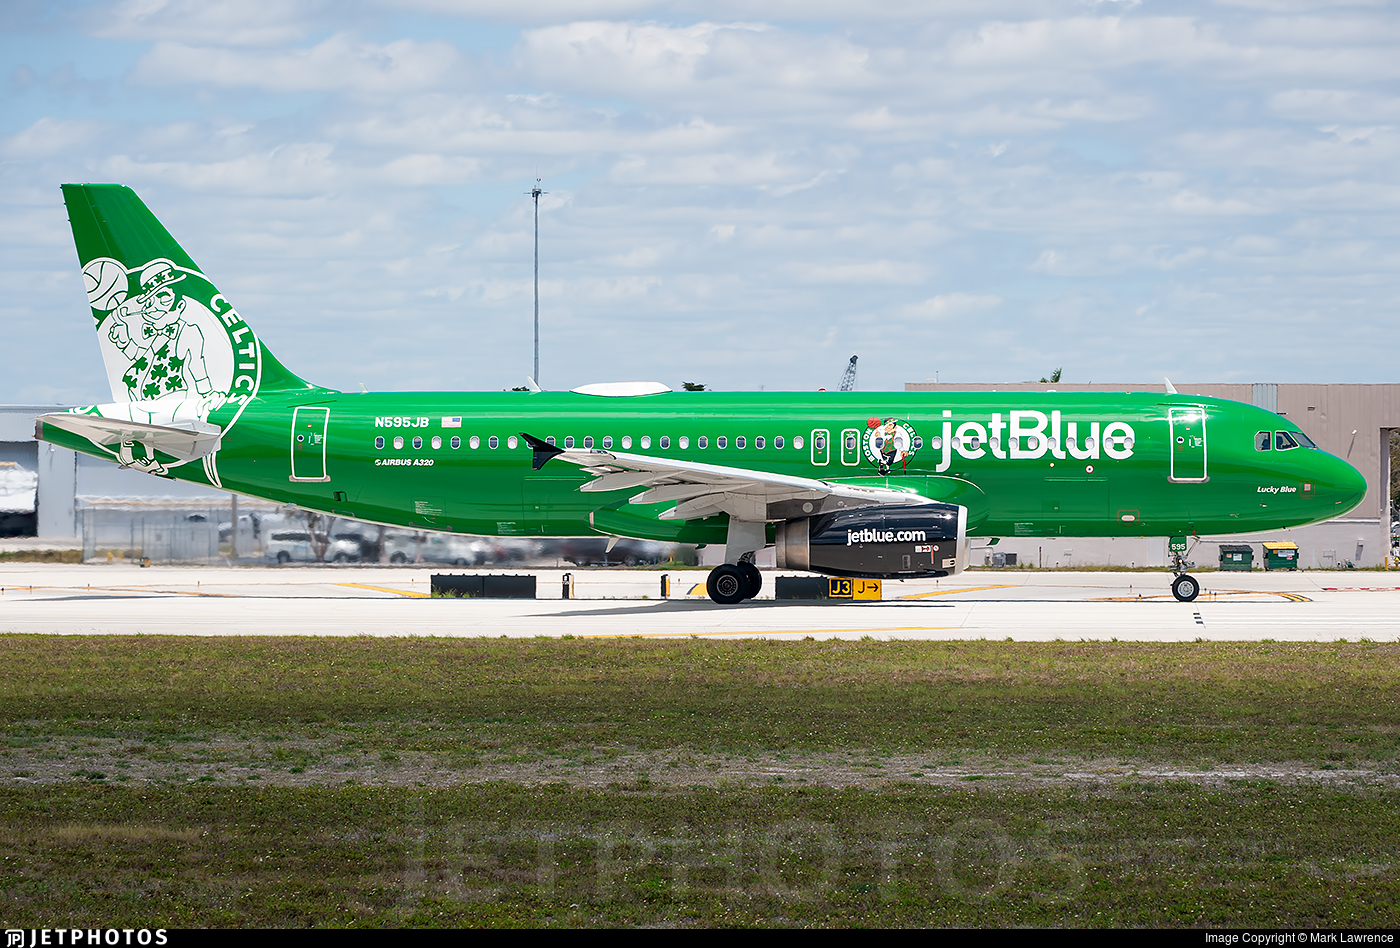 N595JB | Airbus A320-232 | jetBlue Airways | Mark Lawrence | JetPhotos